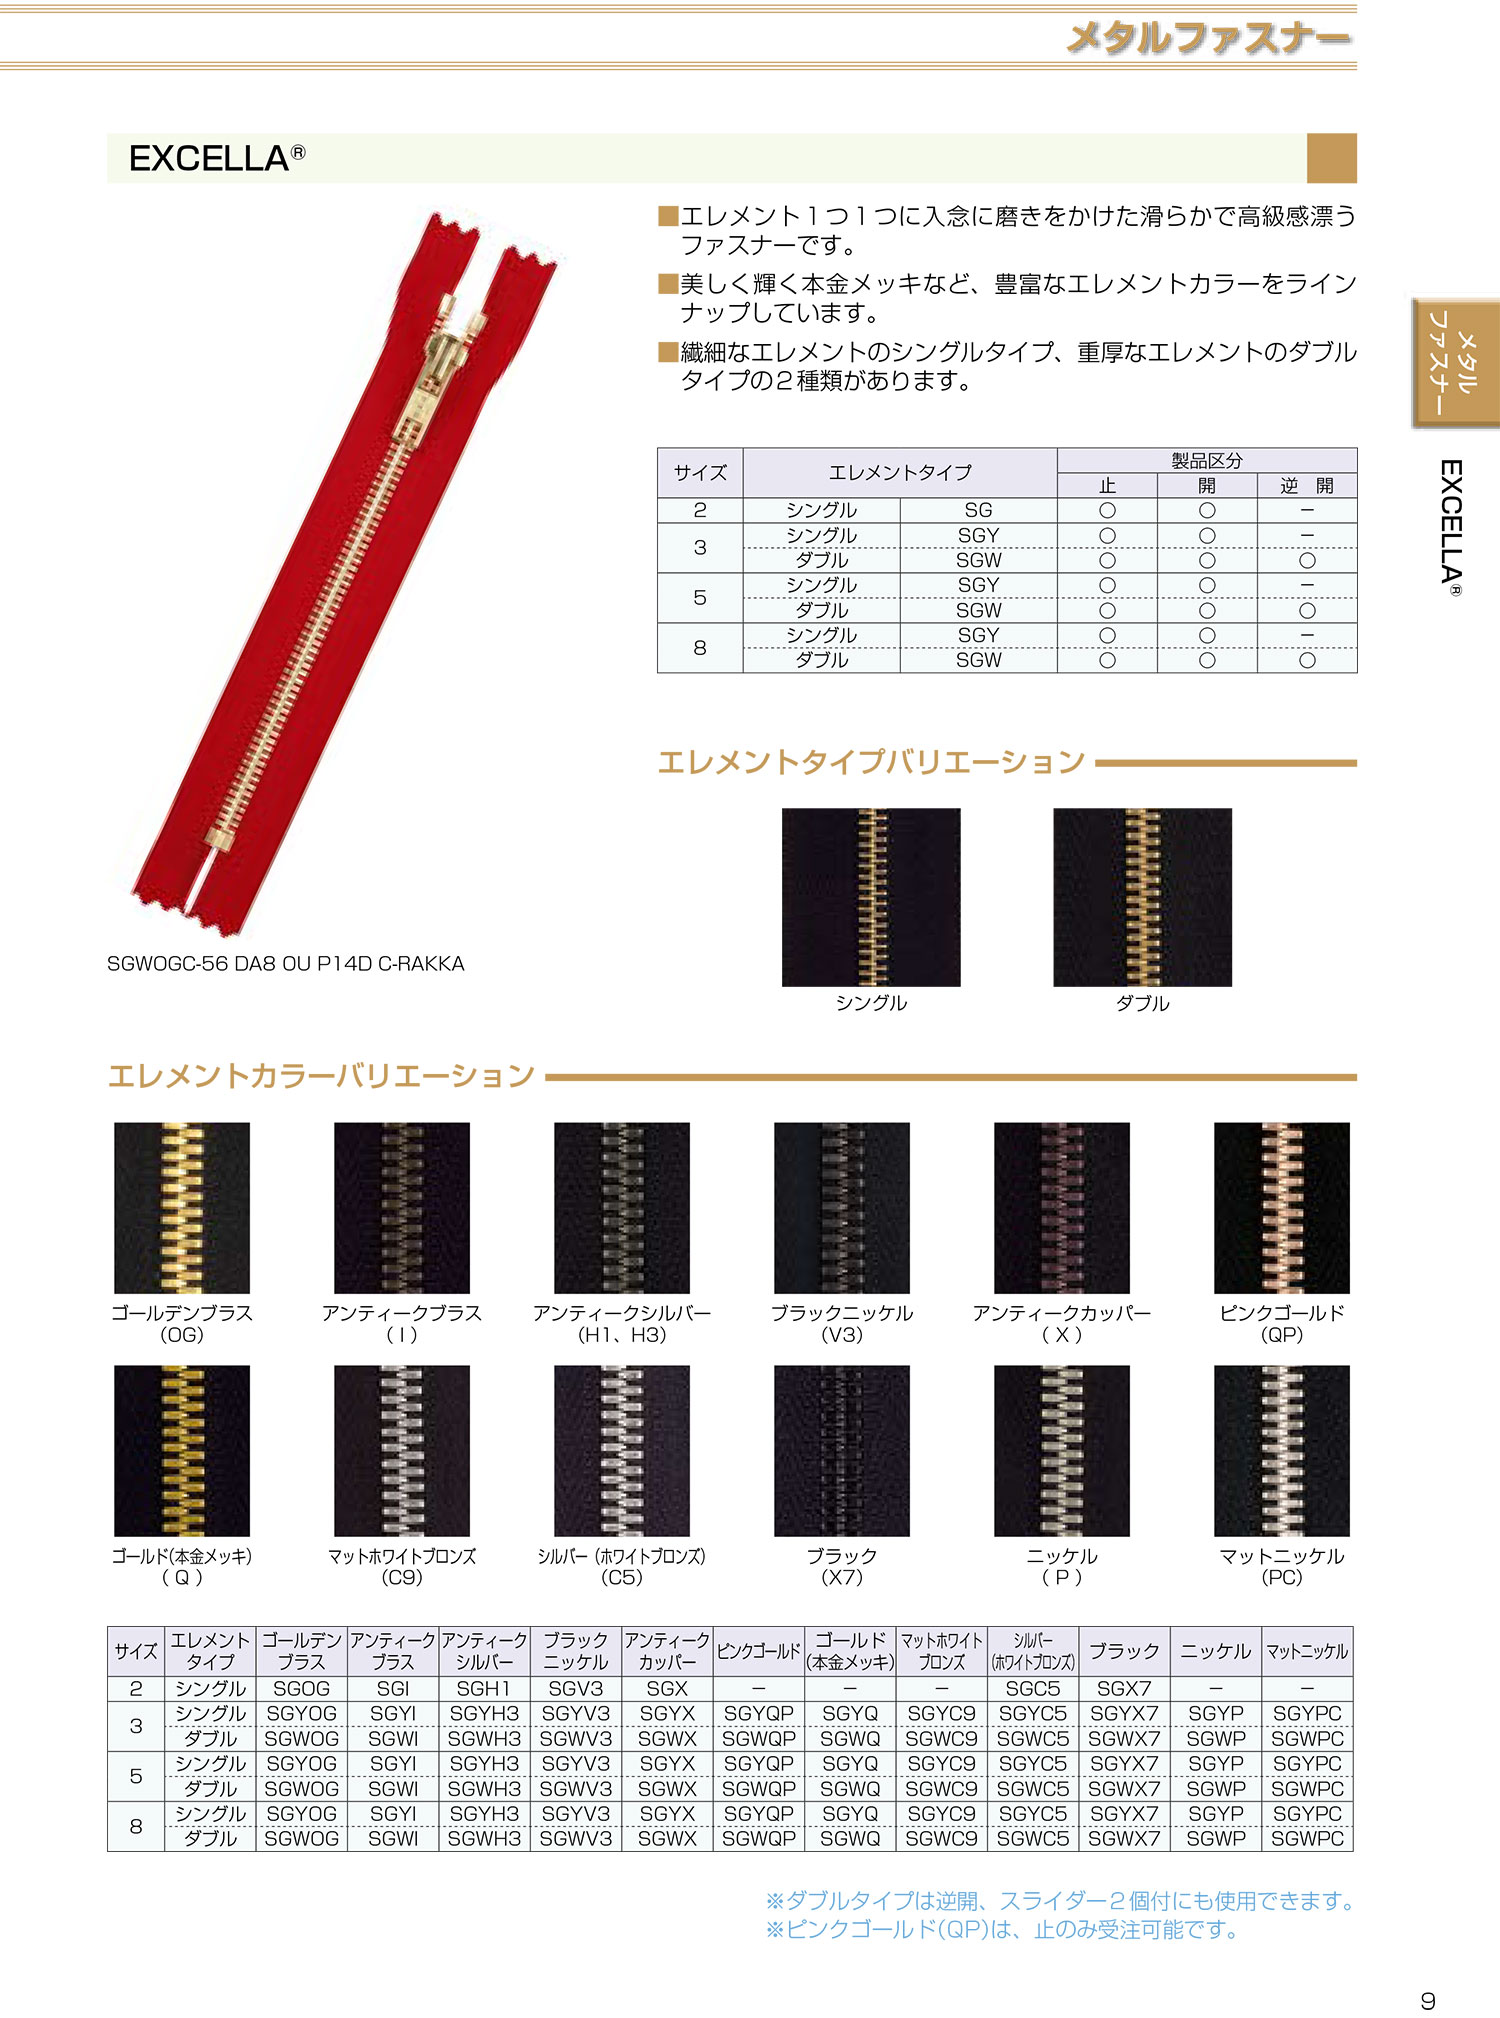 5SGYIOR エクセラ 5サイズ アンティークブラス オープン シングル[ファスナー] YKK/オークラ商事 - ApparelX アパレル資材卸通販